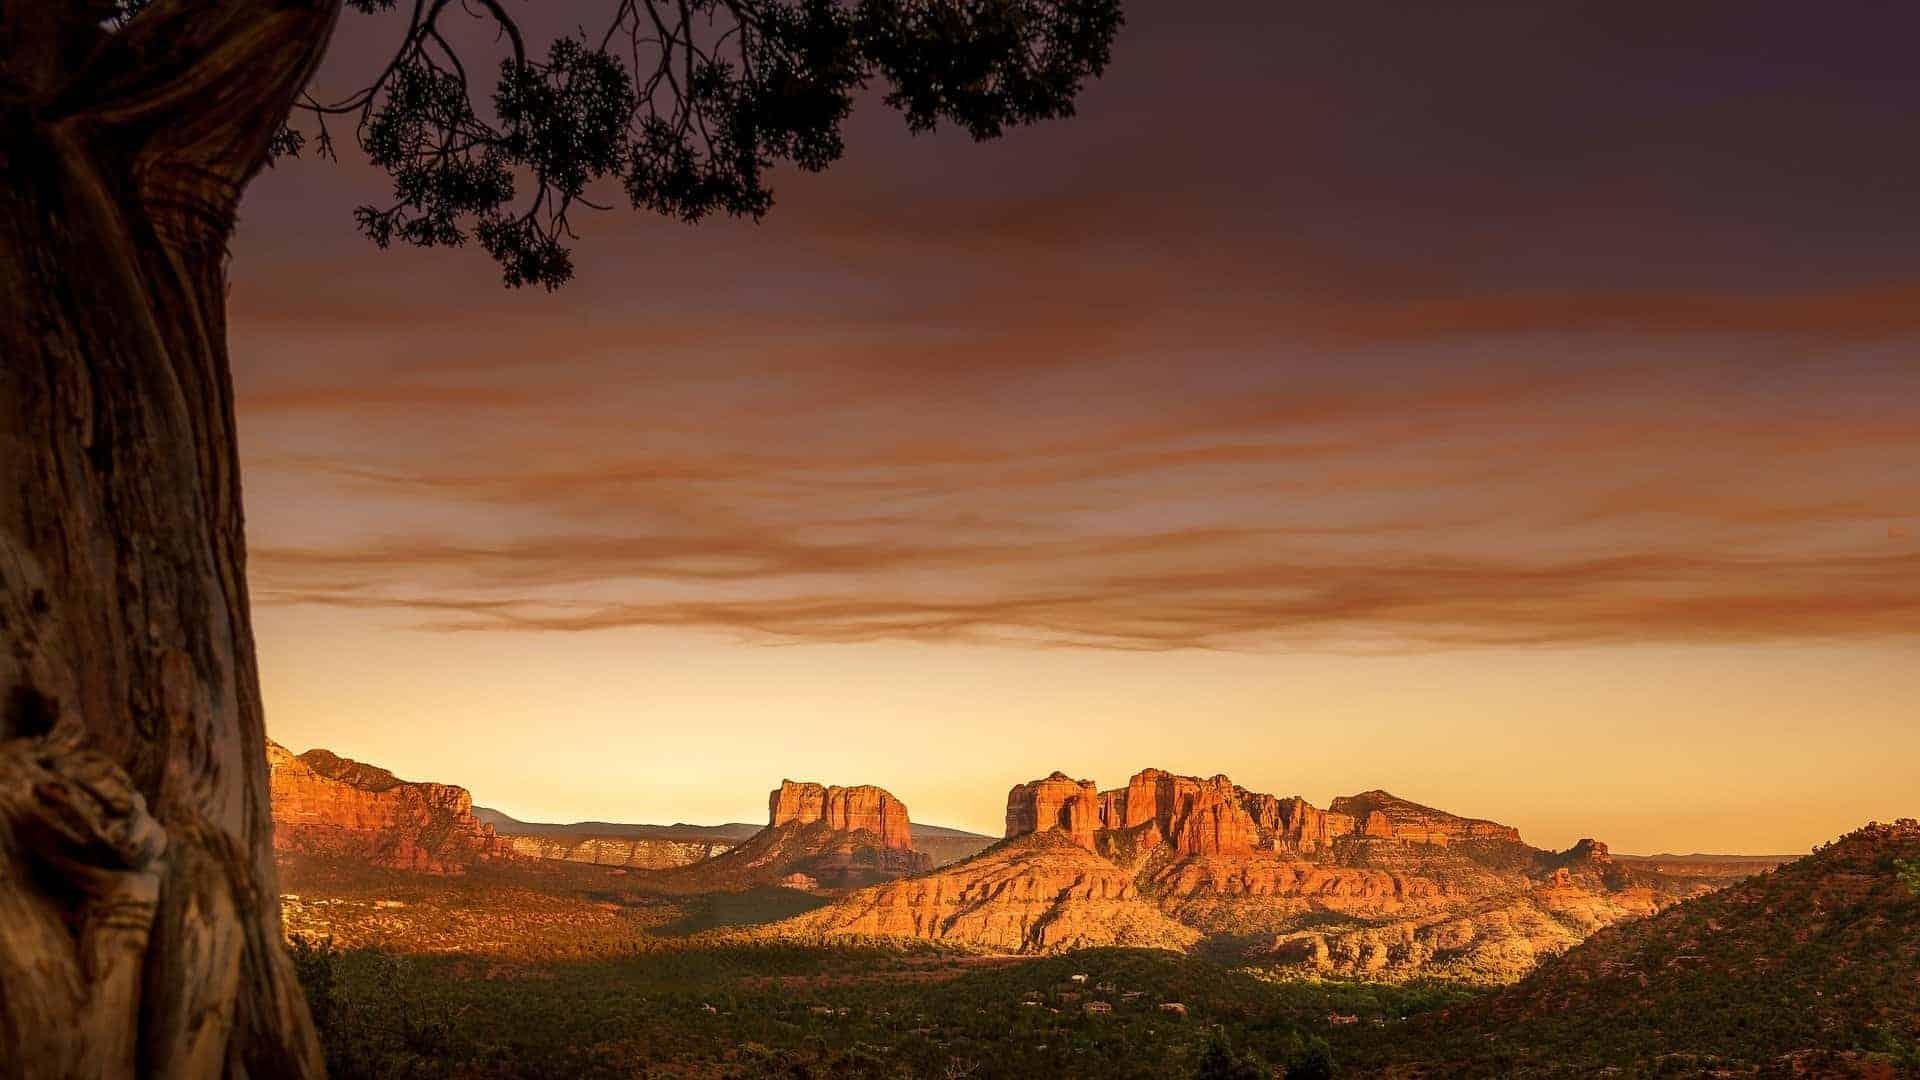 Hikes in Arizona breathtaking landscape